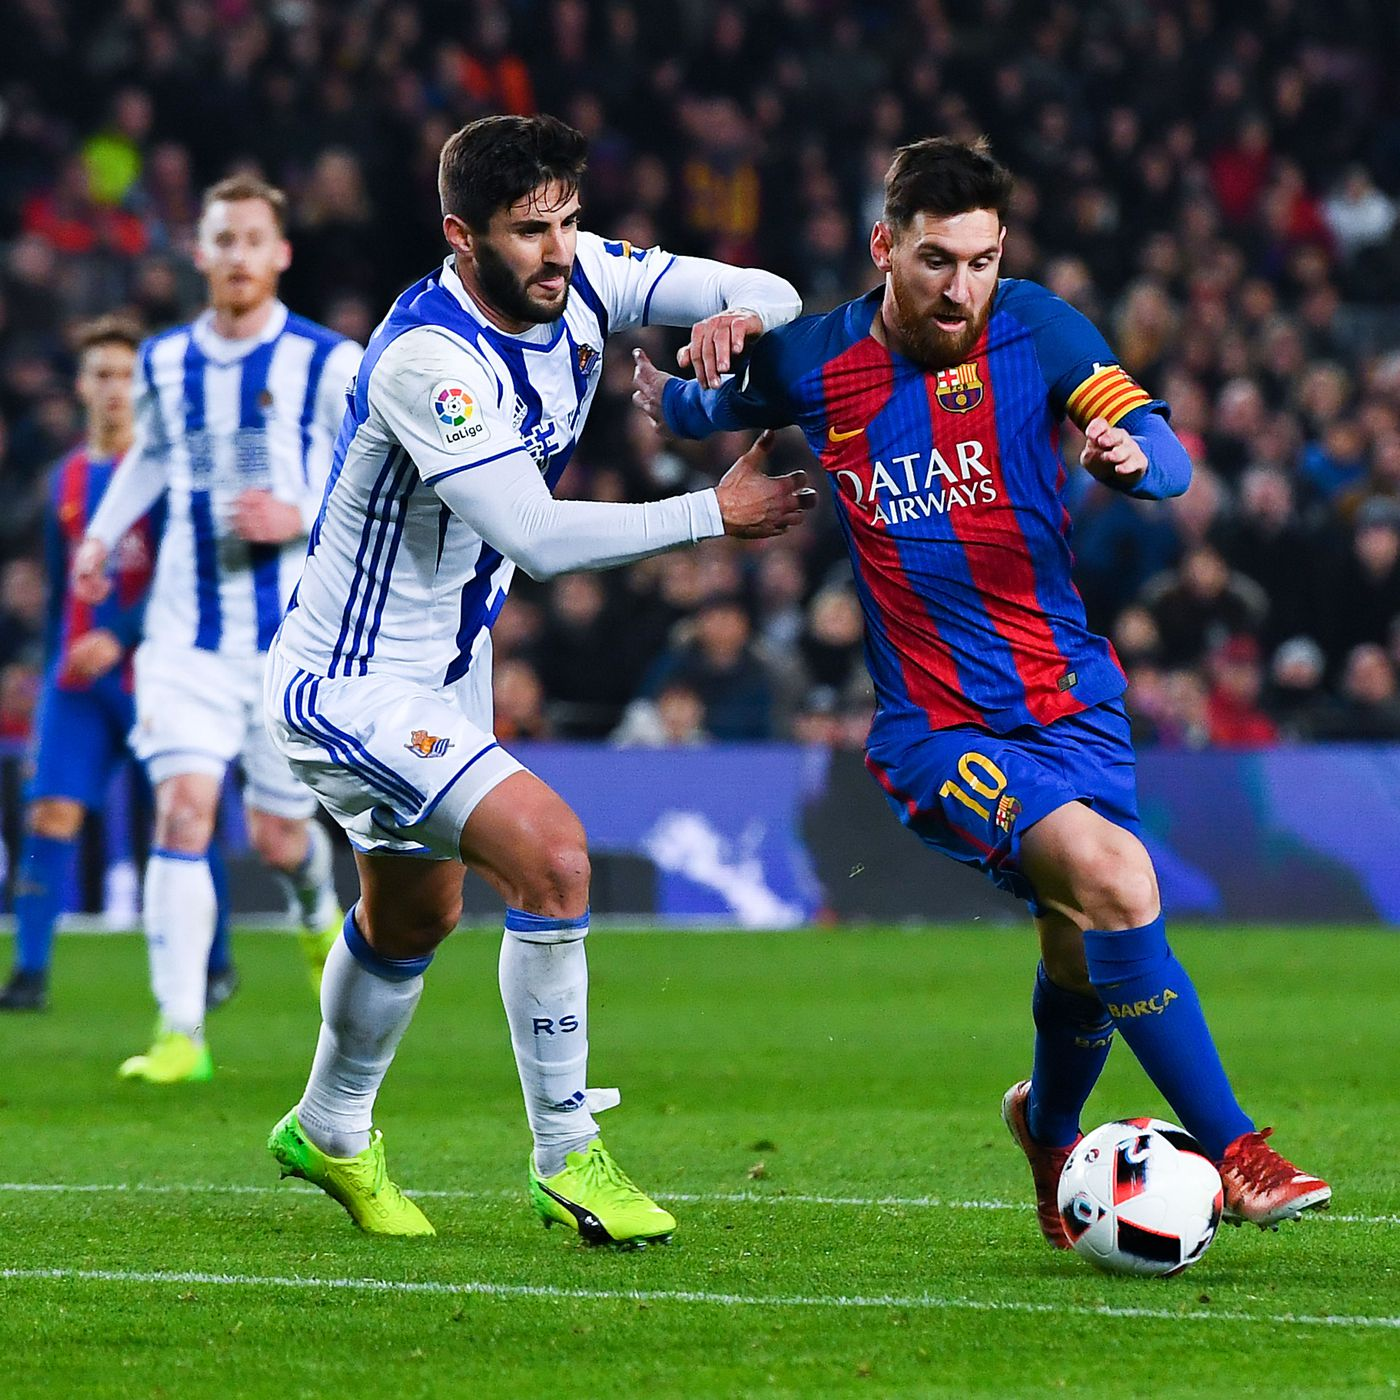 watch barcelona vs real sociedad live stream free online